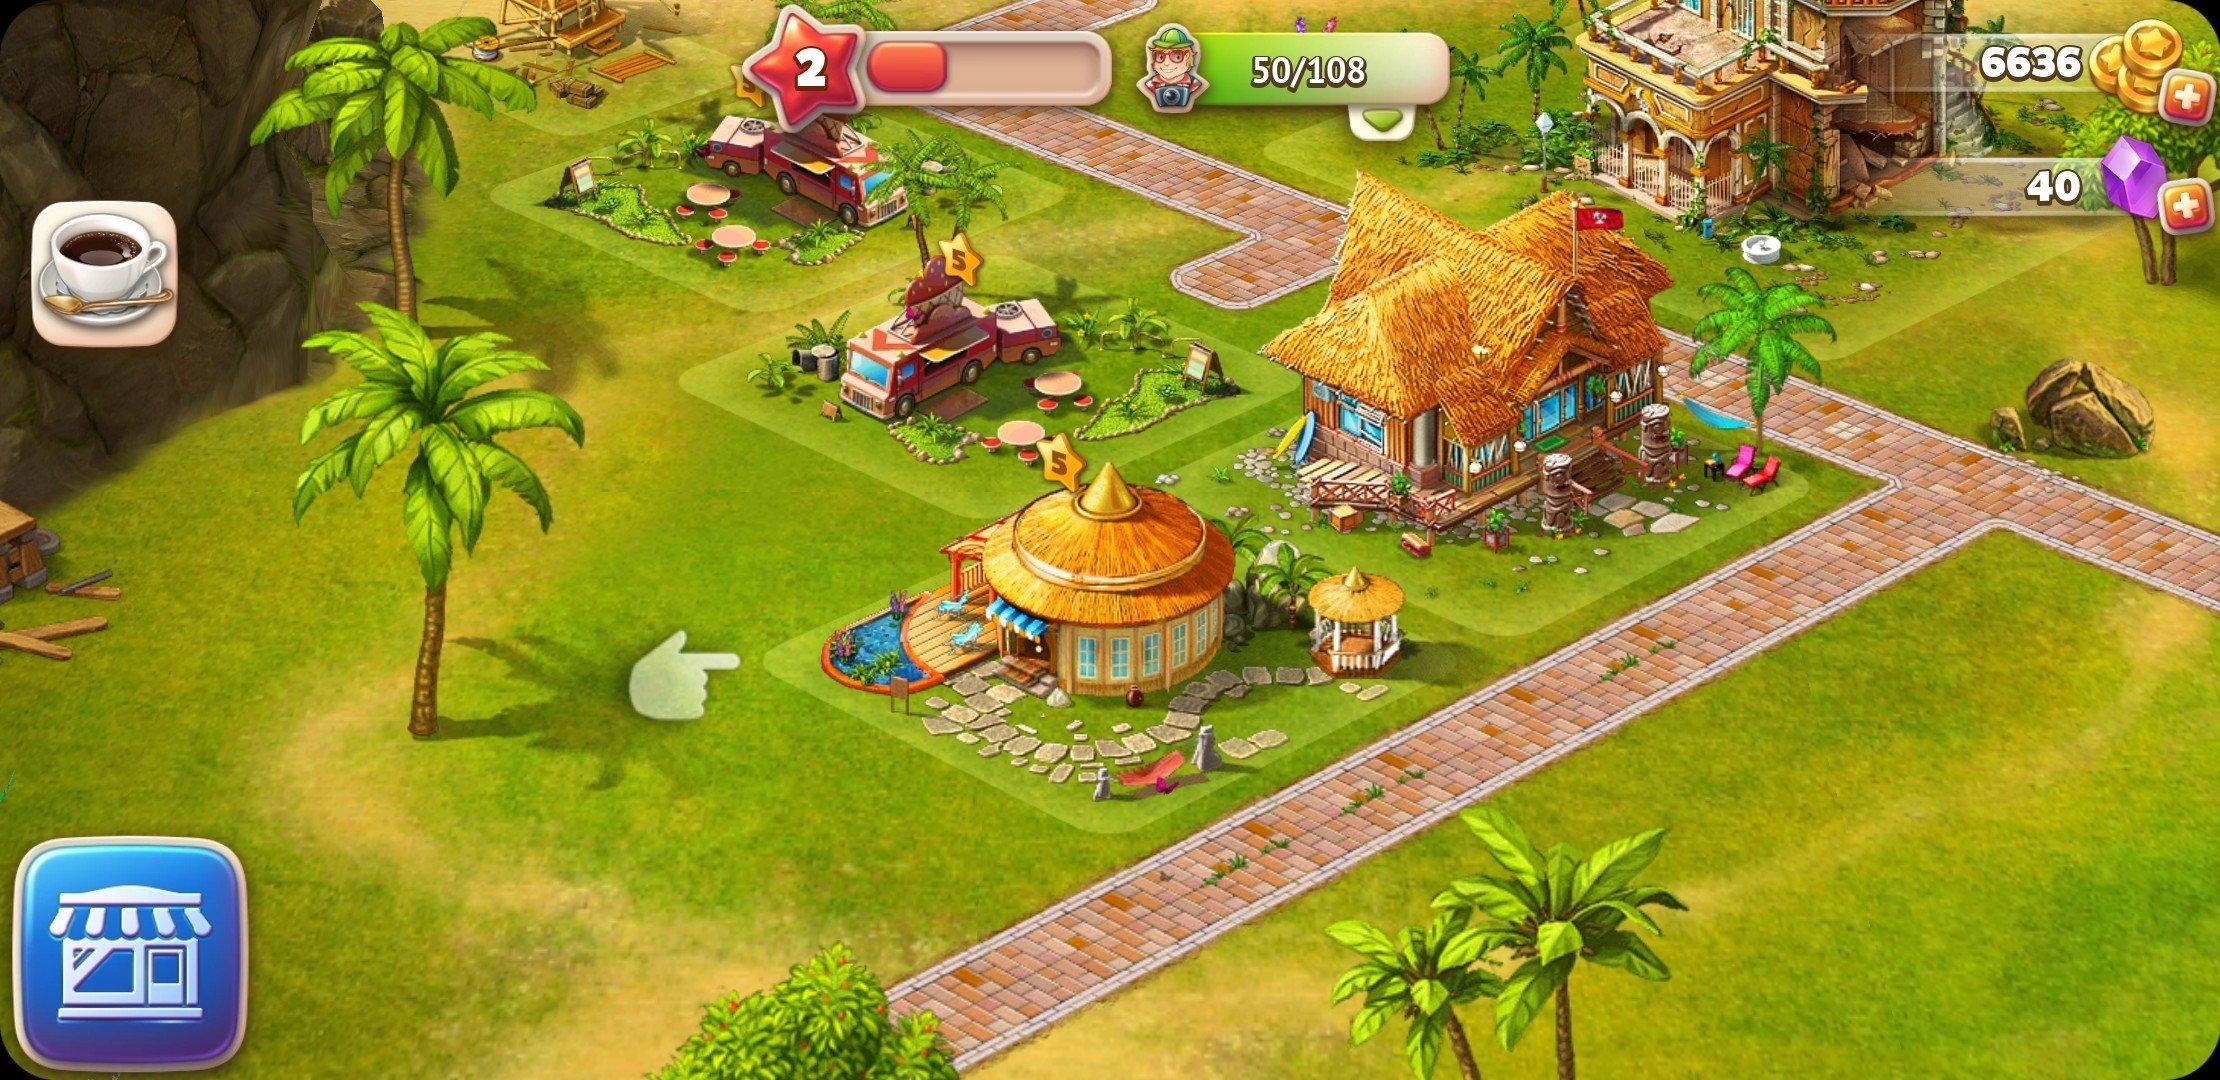 Paradise Island 2 Android image 5